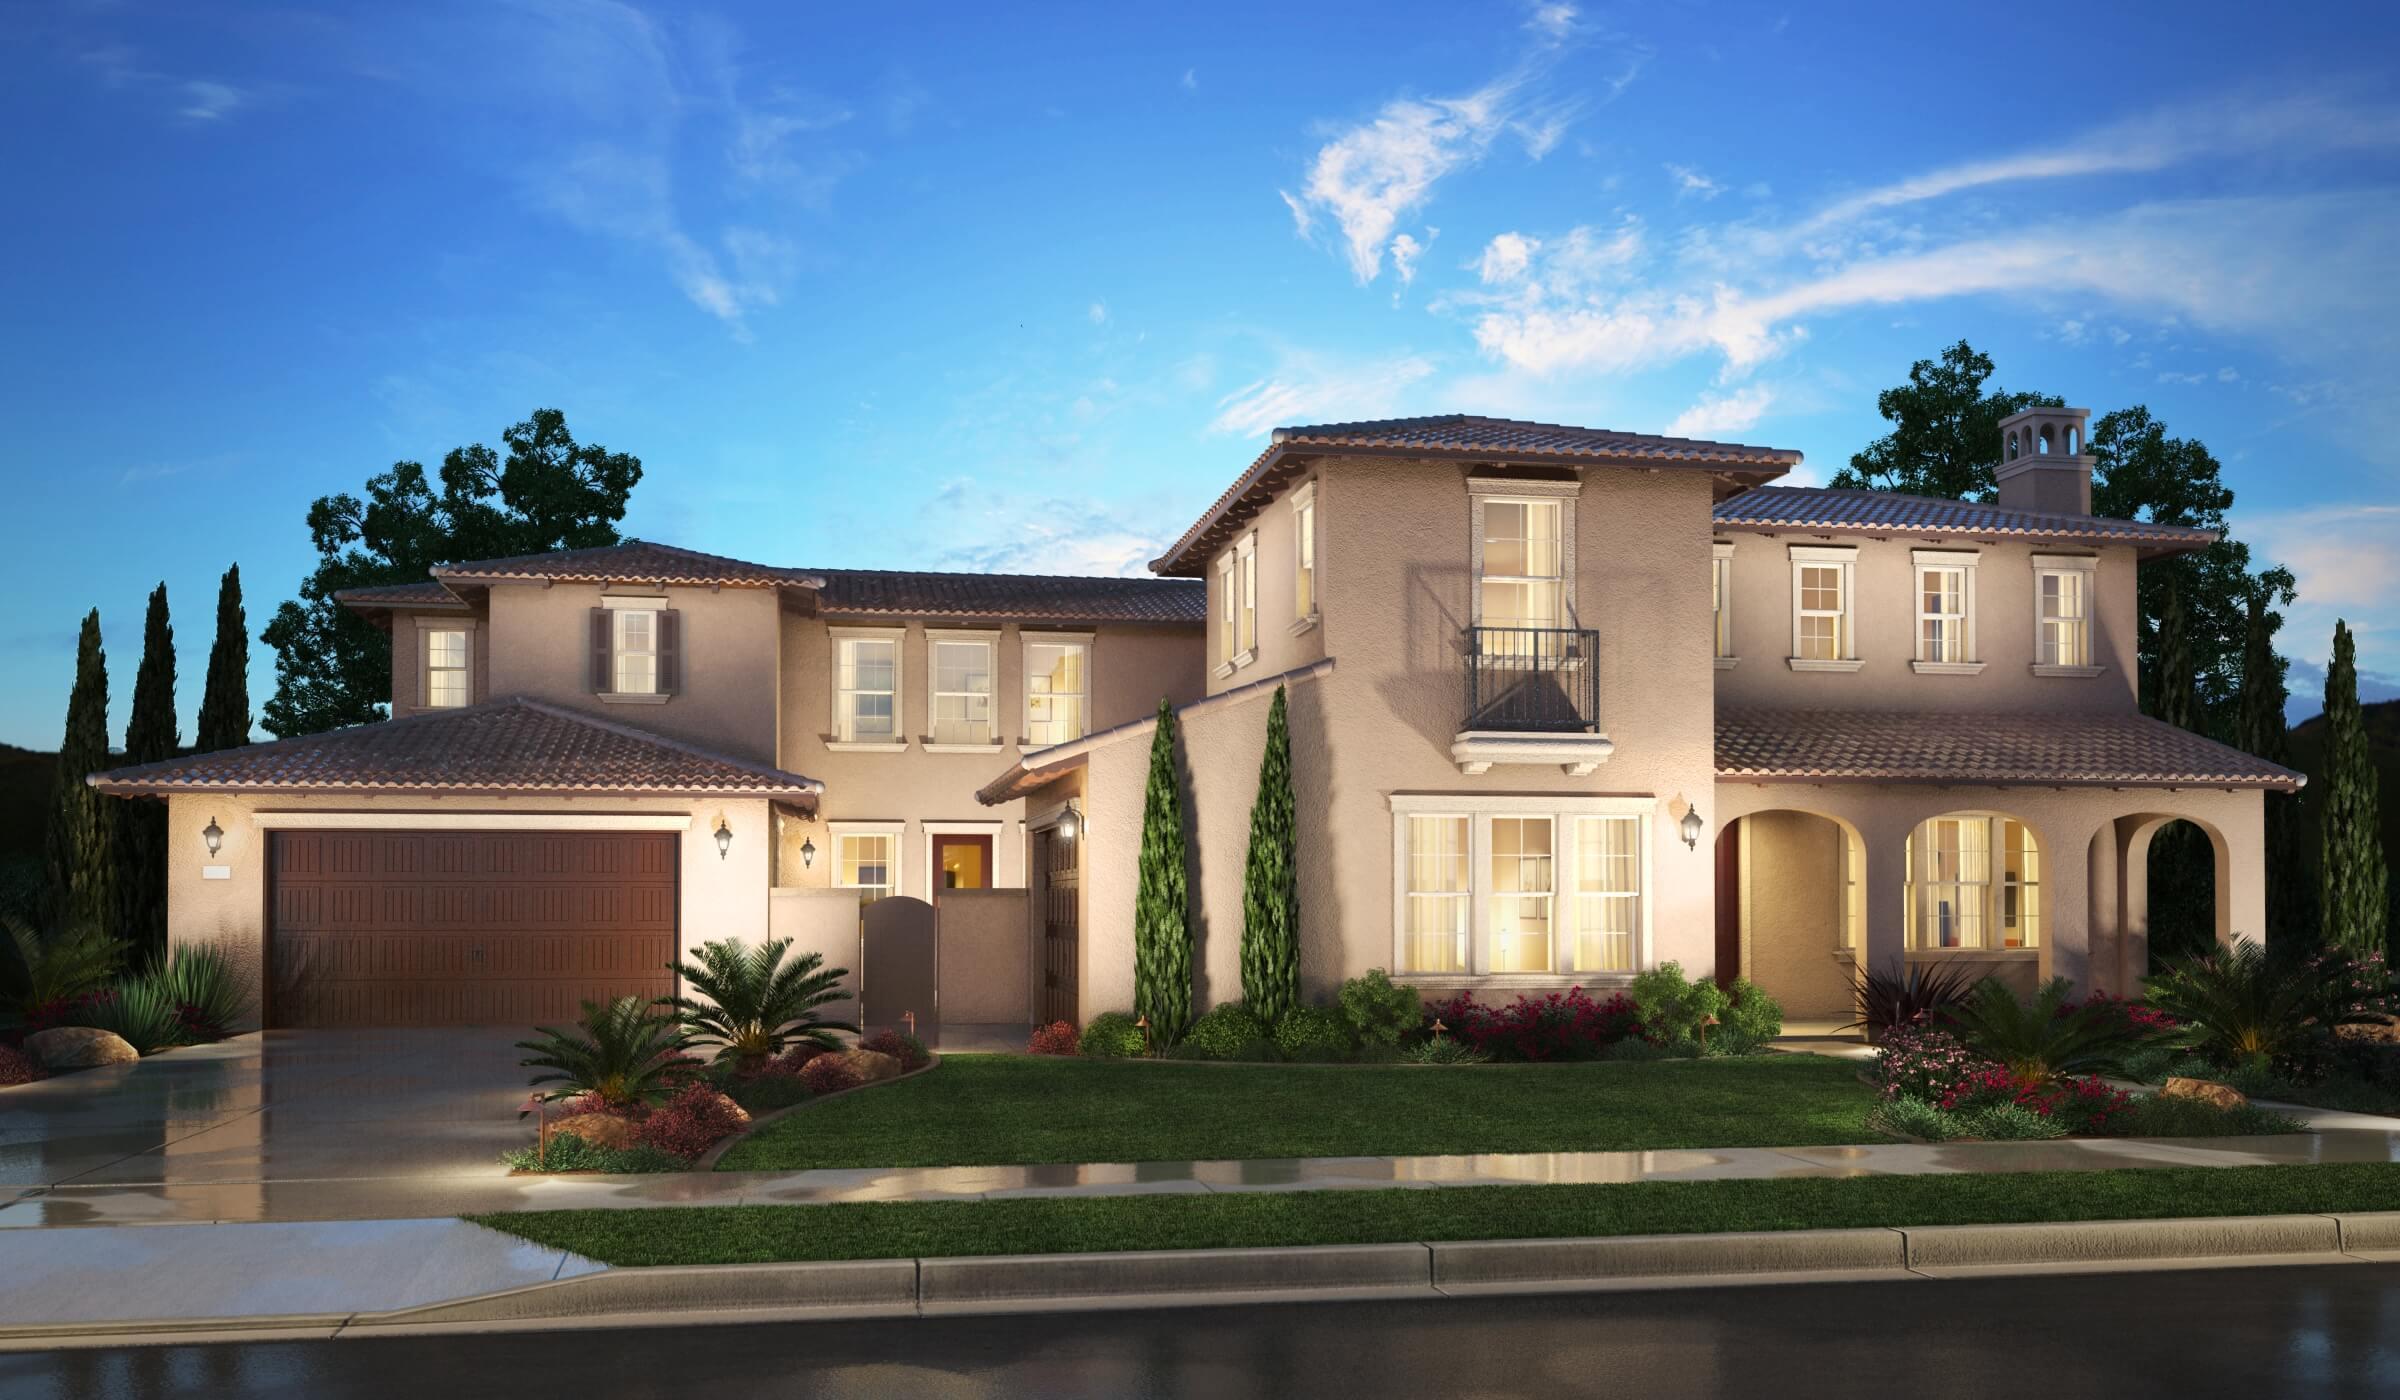 Single Family for Sale at La Colina Estates - Residence 6 1203 Iris Lane Glendora, California 91741 United States